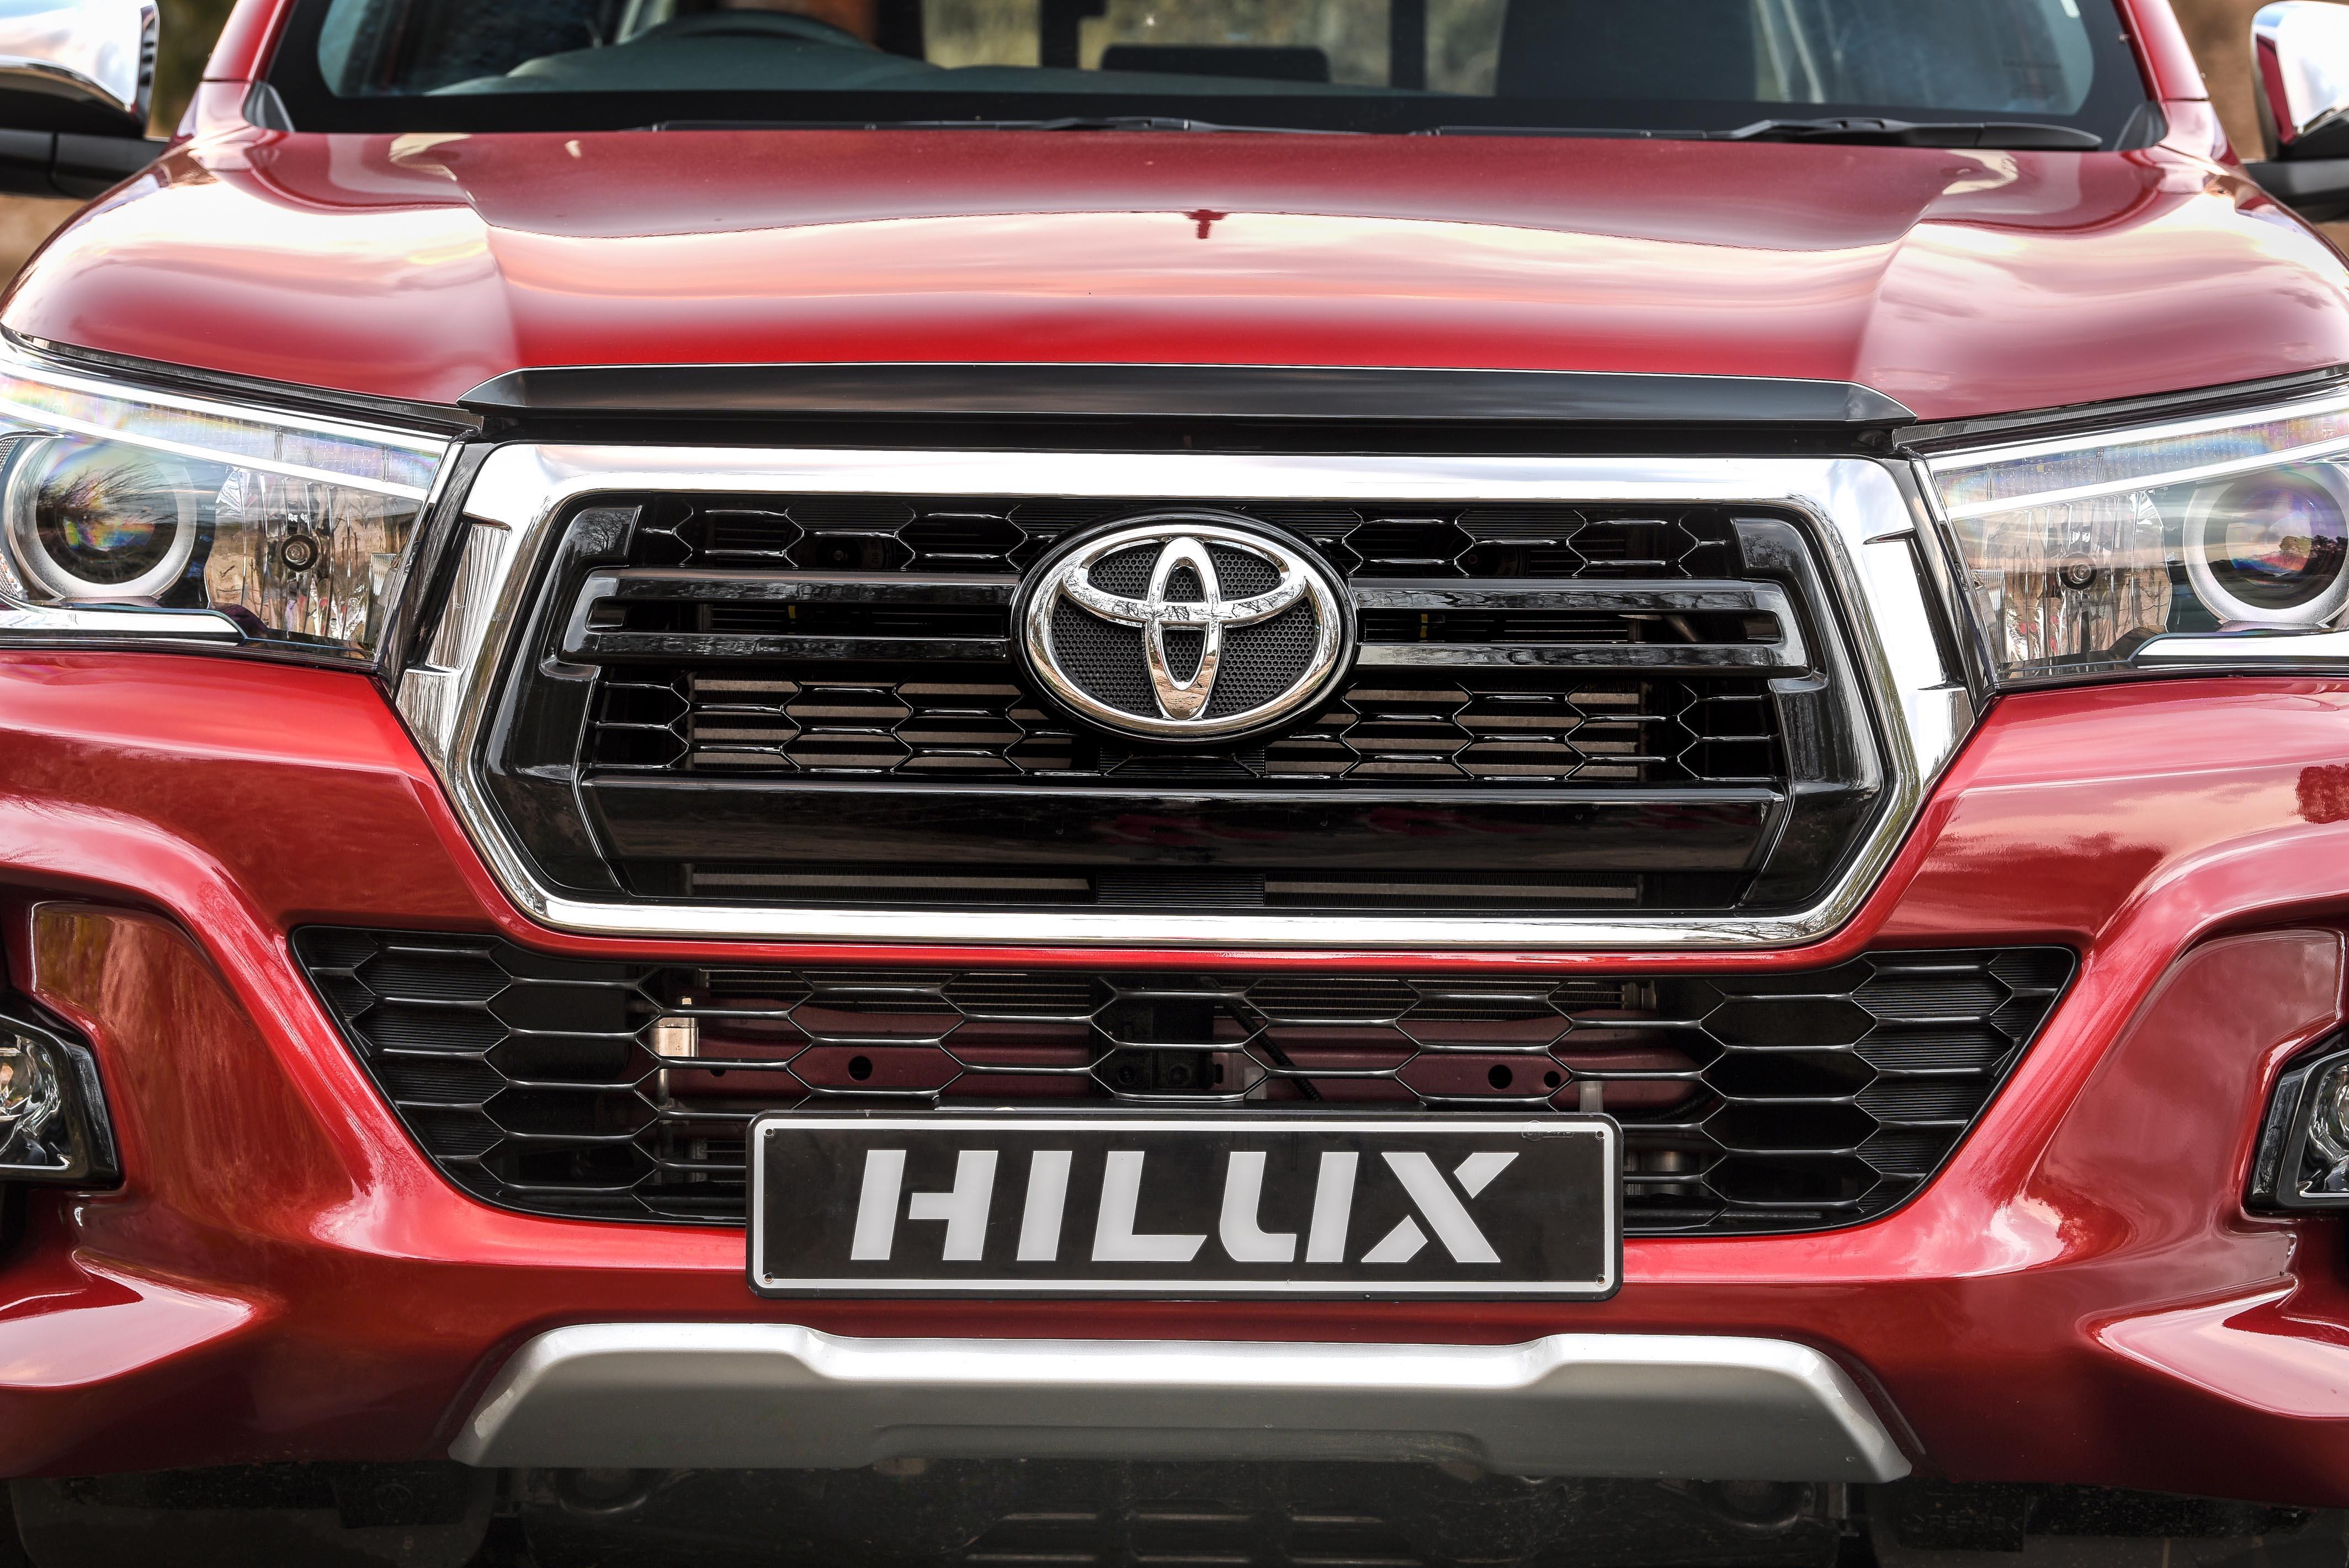 Toyota Hilux D/Cab 2 8 GD-6 Raider 4x4 Manual: Benchmar